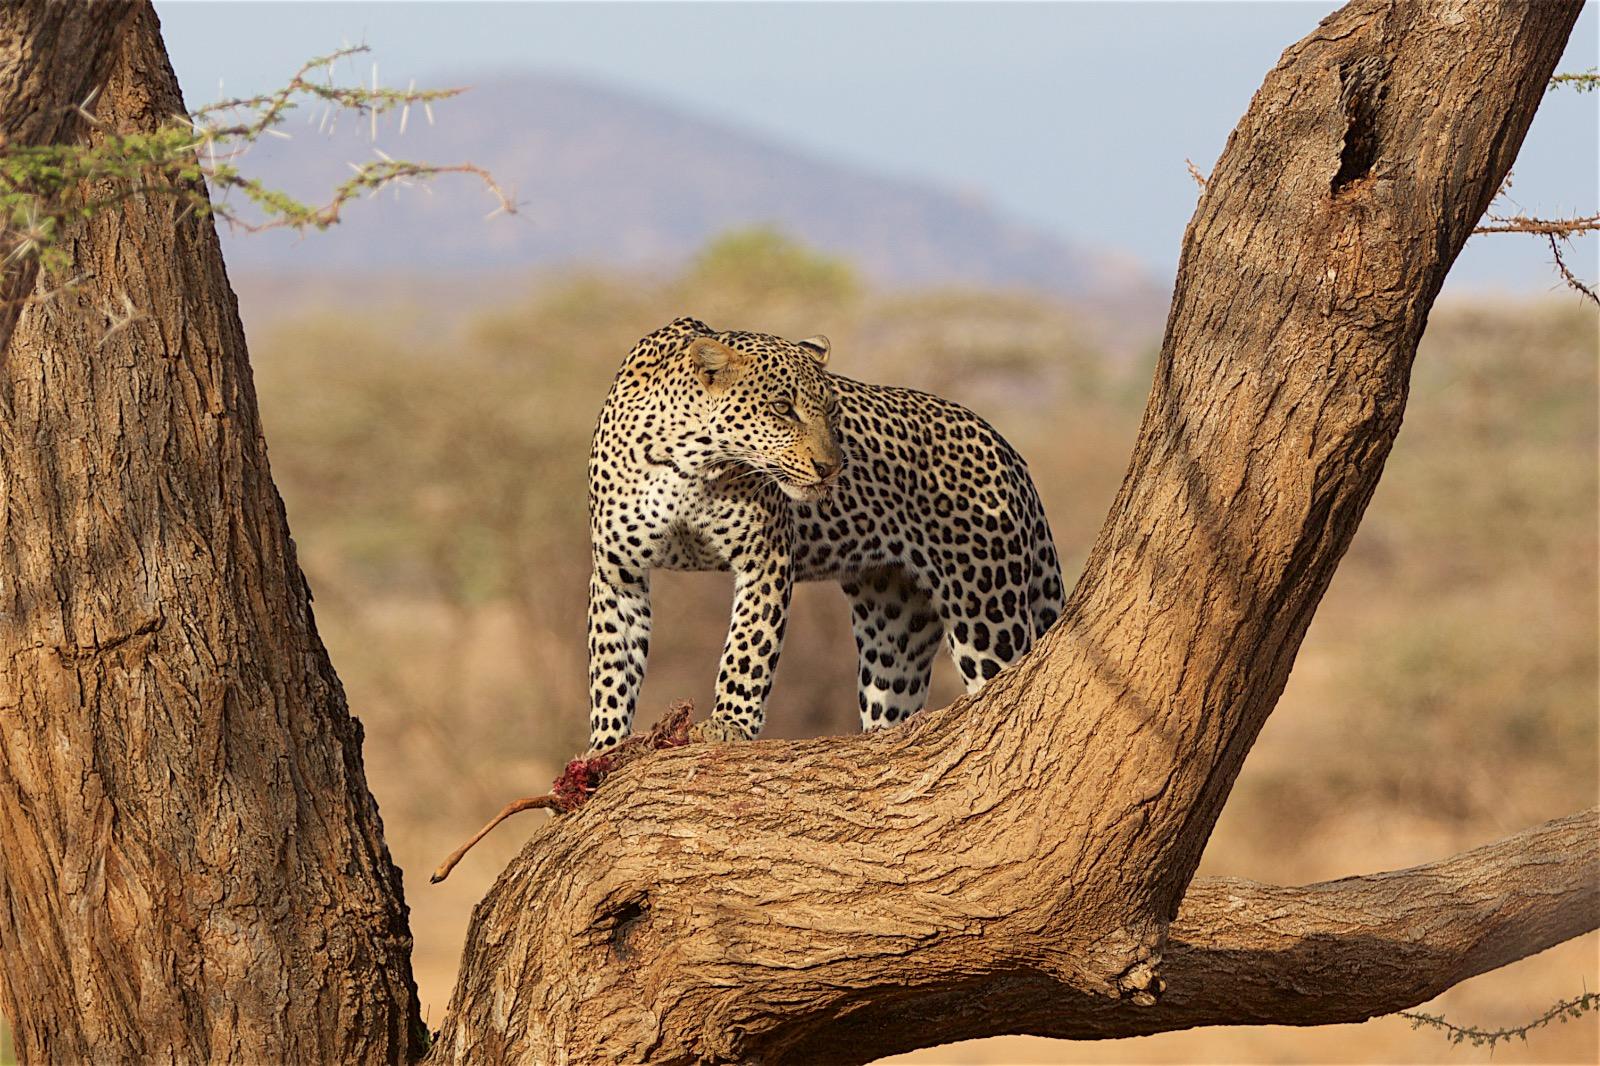 Rejseguide til safari